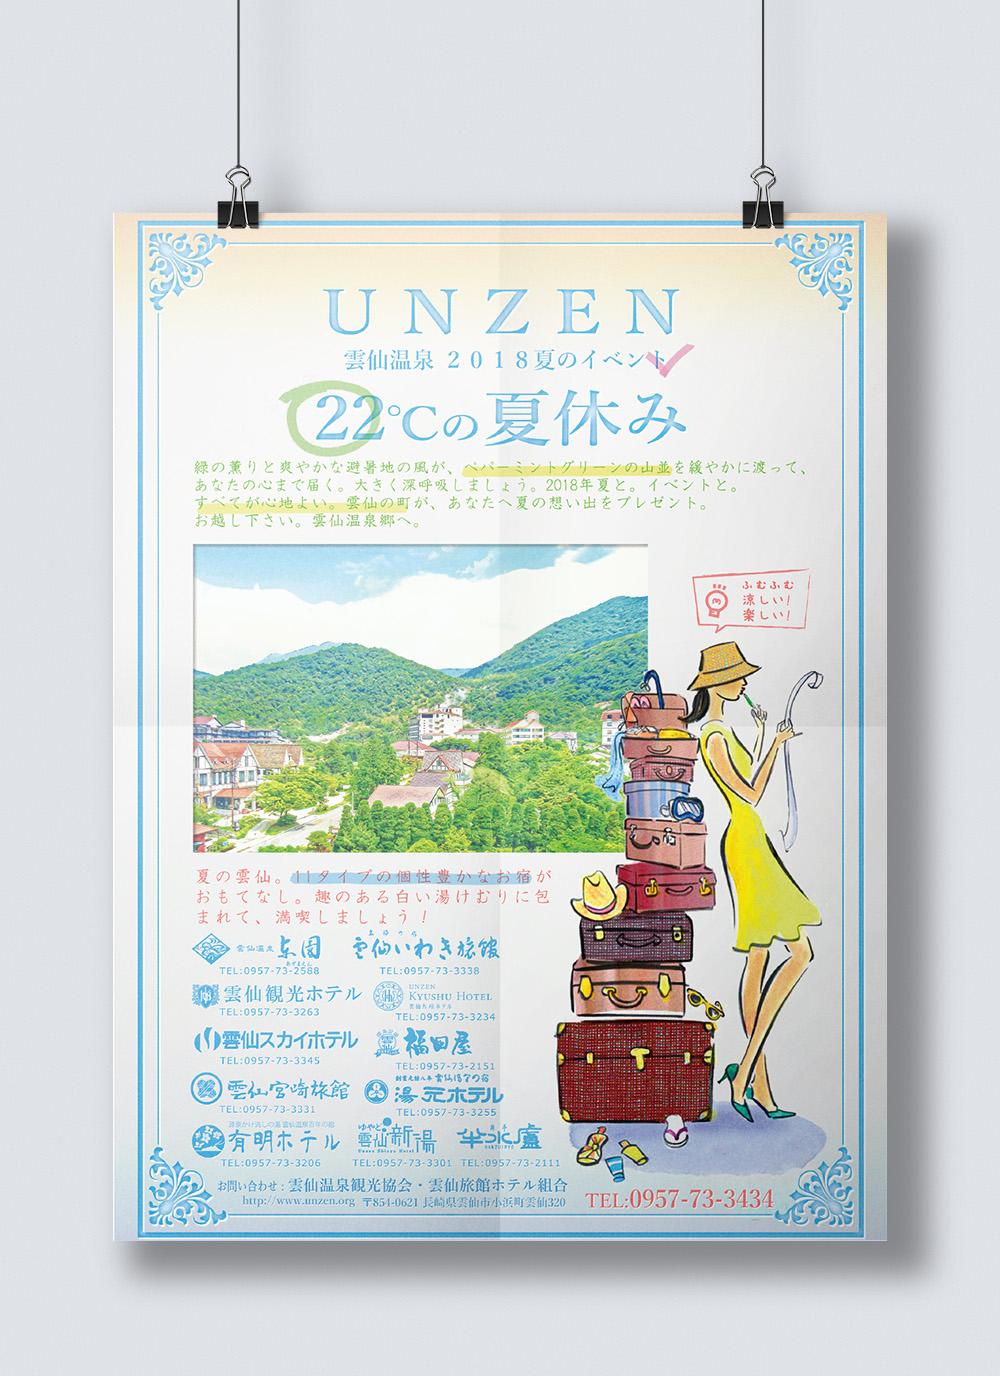 unzen summer event flyer jean inc